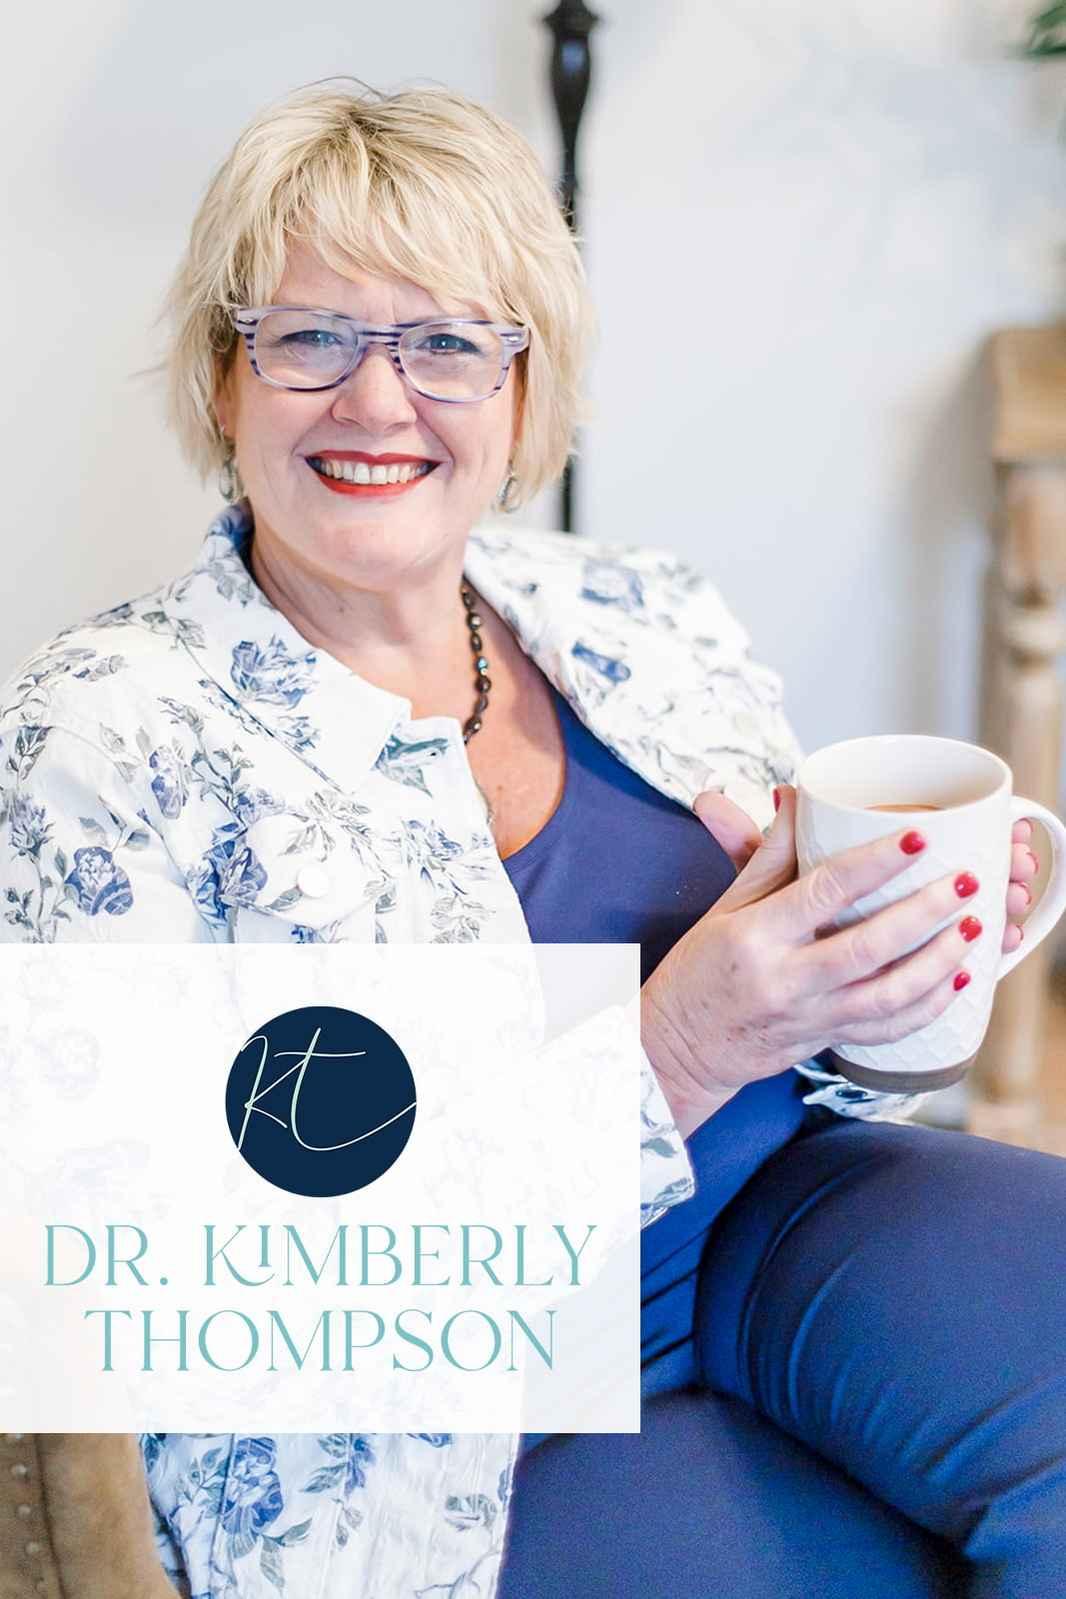 Dr Kimberly Thompson Website Headshot with Logo